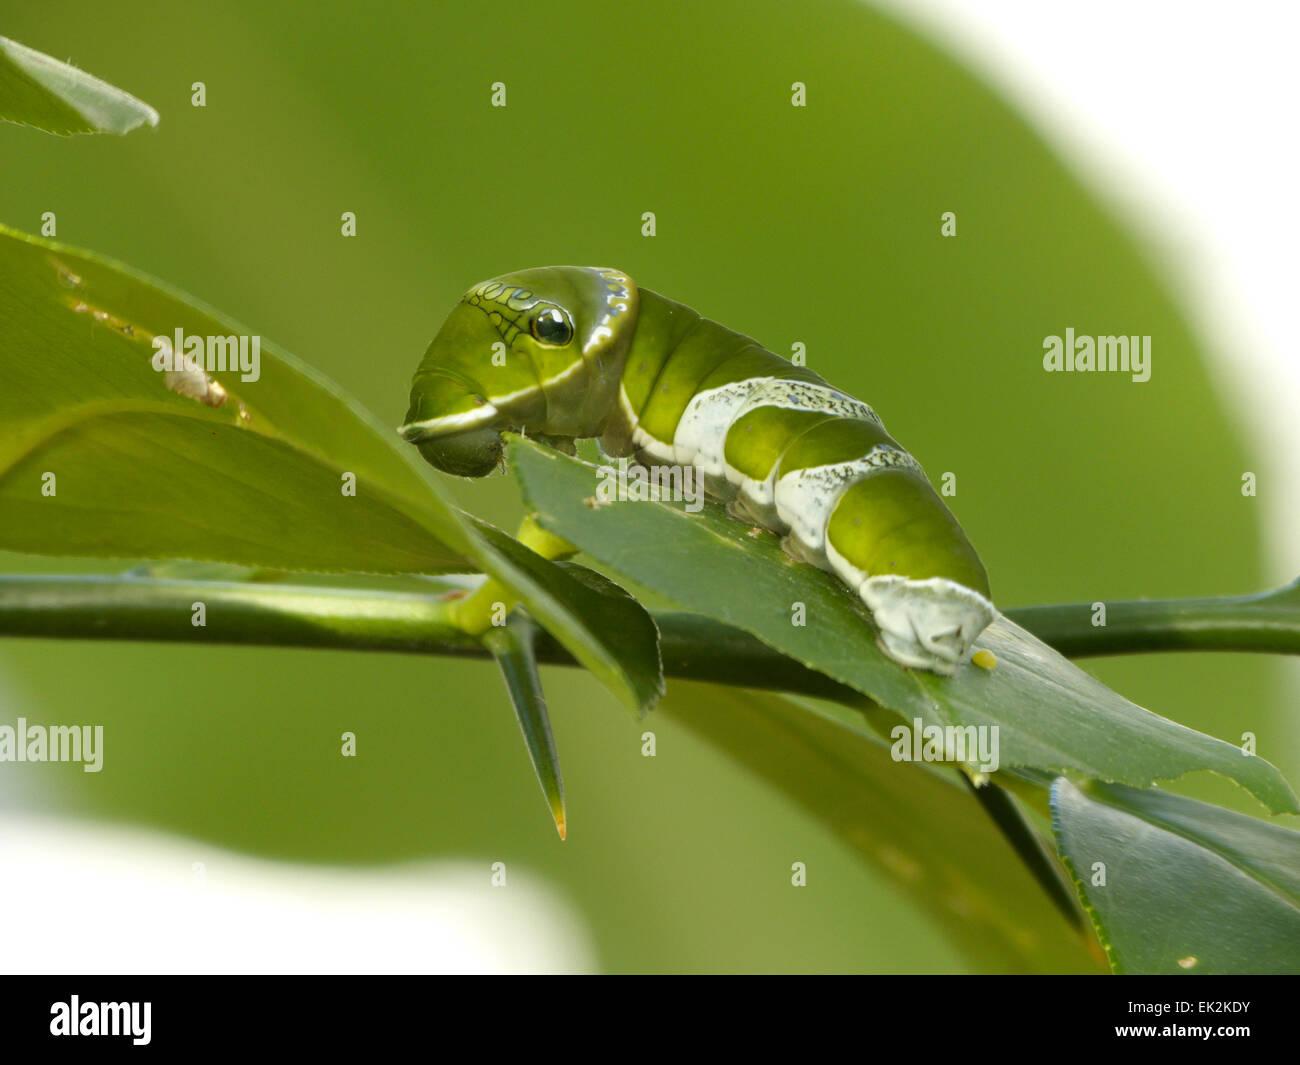 Agrumi (calce, limone) a coda di rondine Caterpillar butterfly Papilio demoleus Immagini Stock